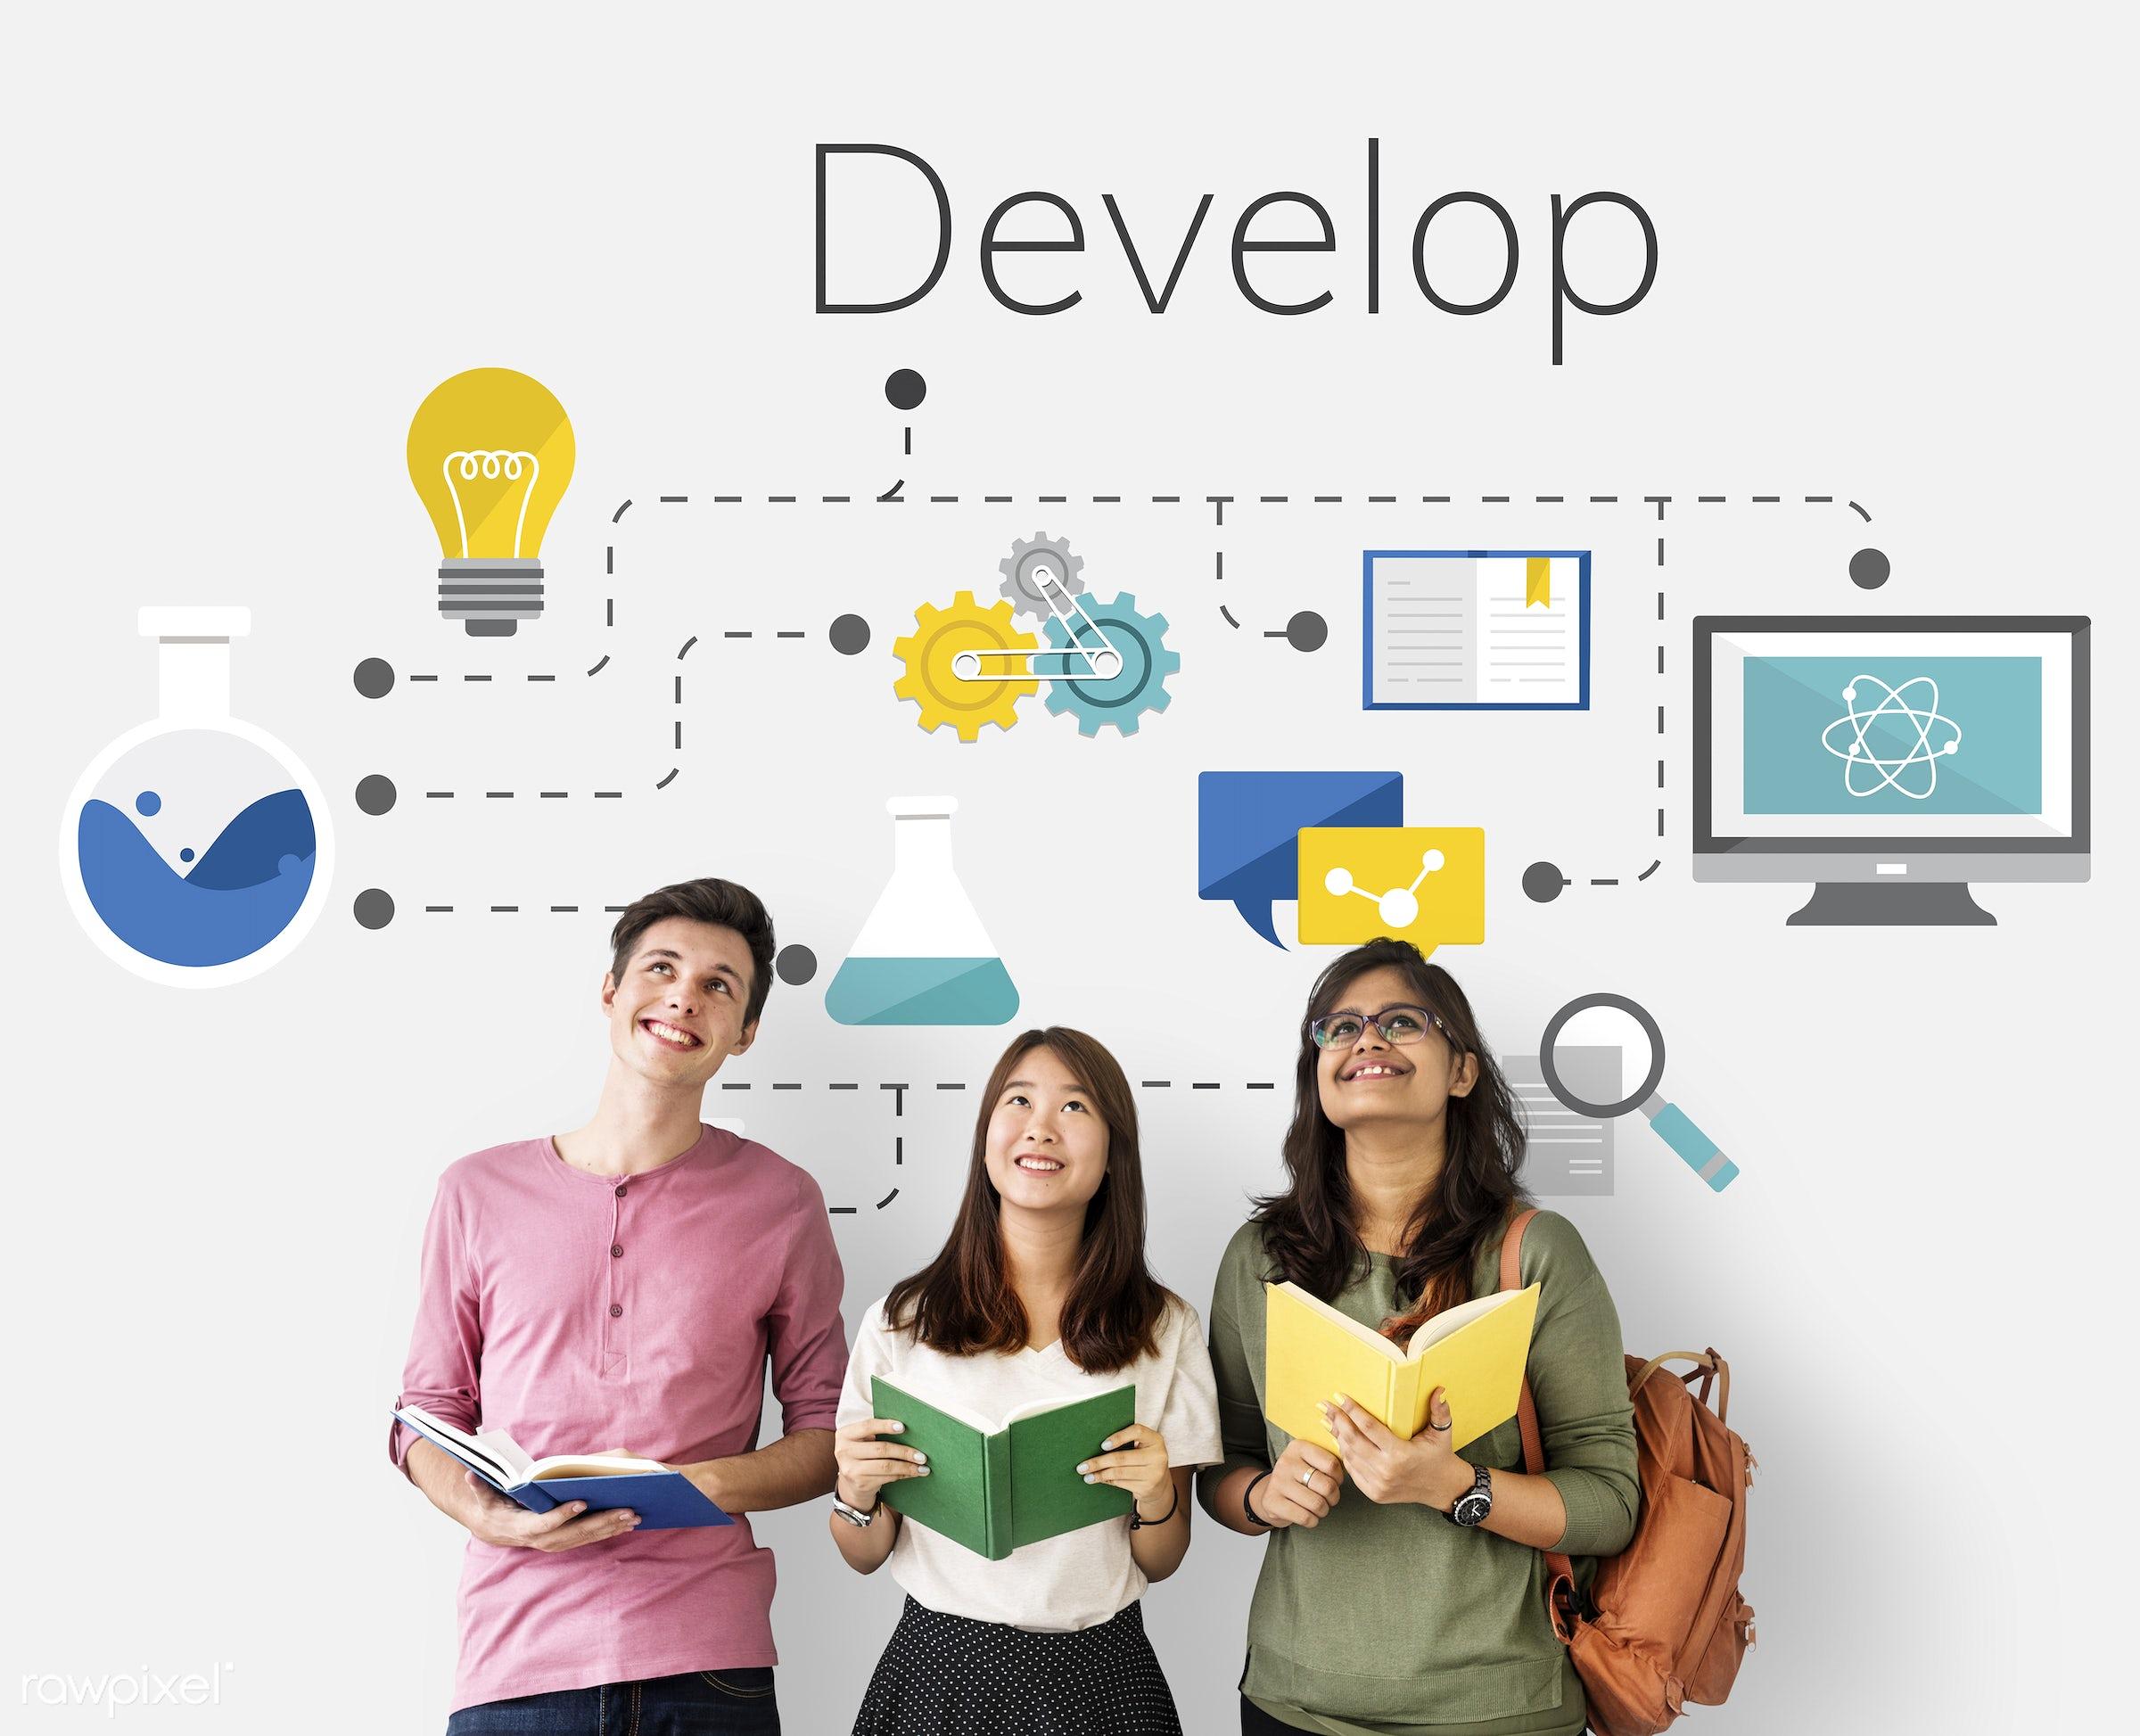 african descent, asian, book, business, caucasian, cloud, connection, control, creative, data, design, development, digital...